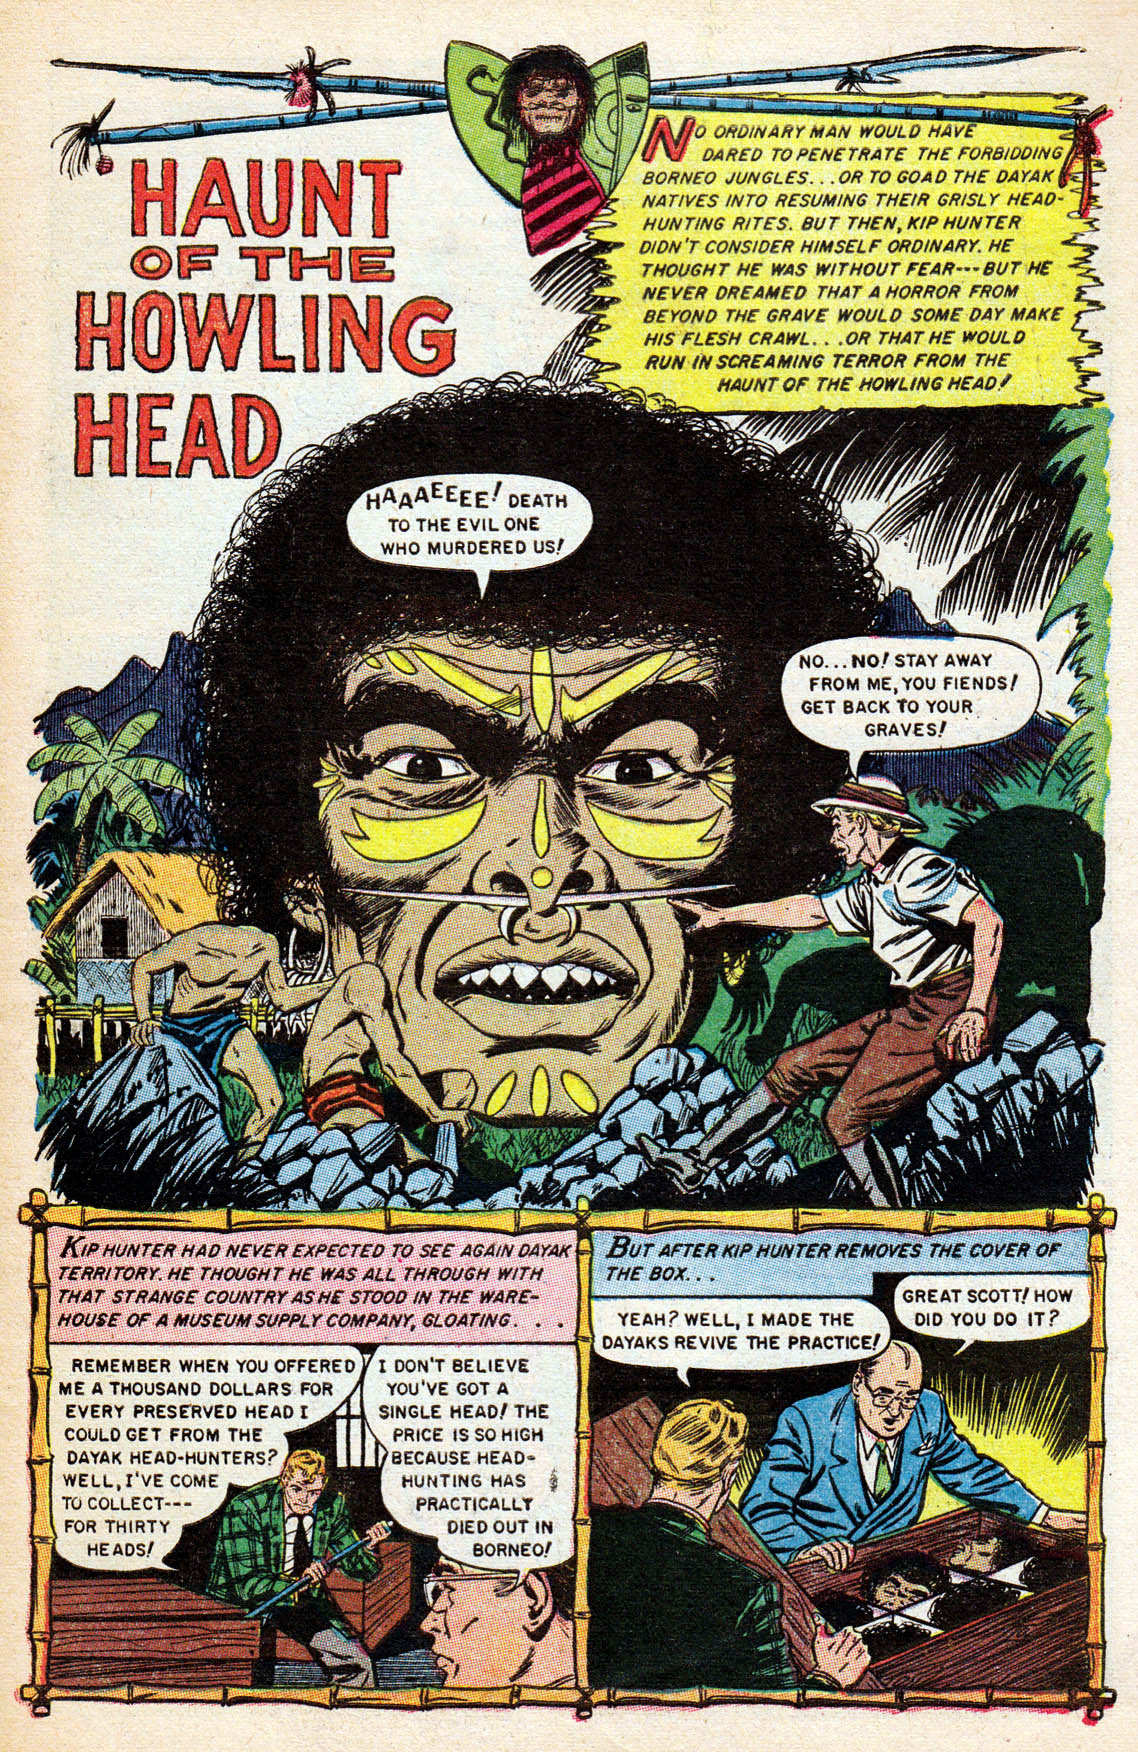 HauntHowling1